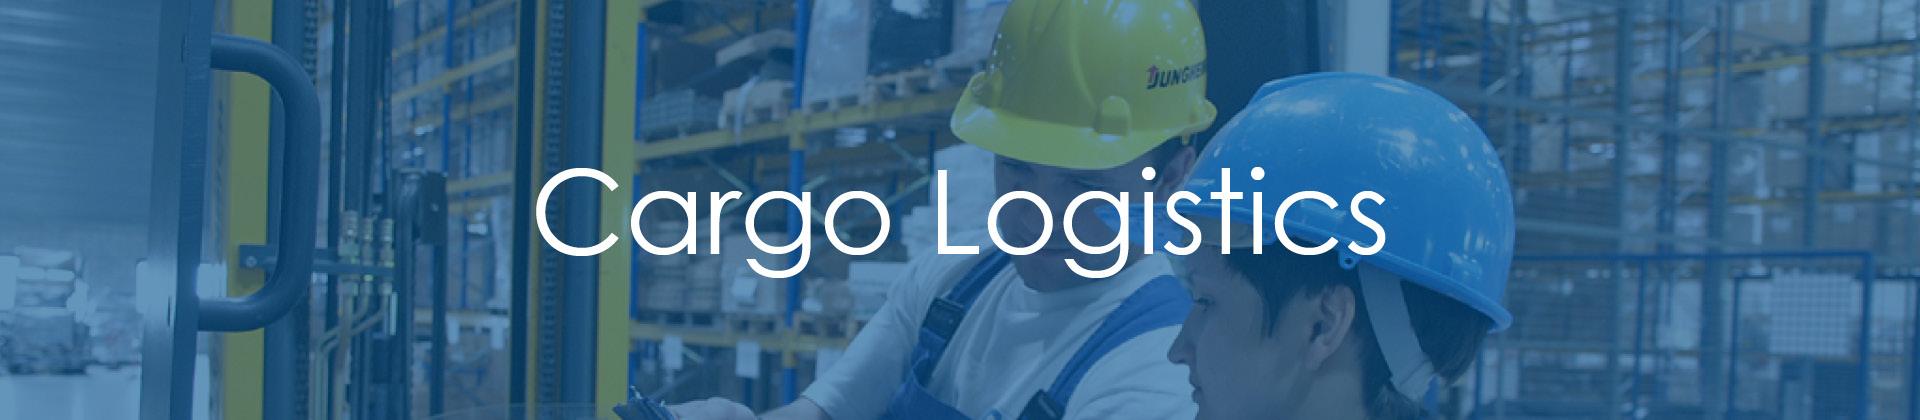 Cargo Logistics - Group CAT